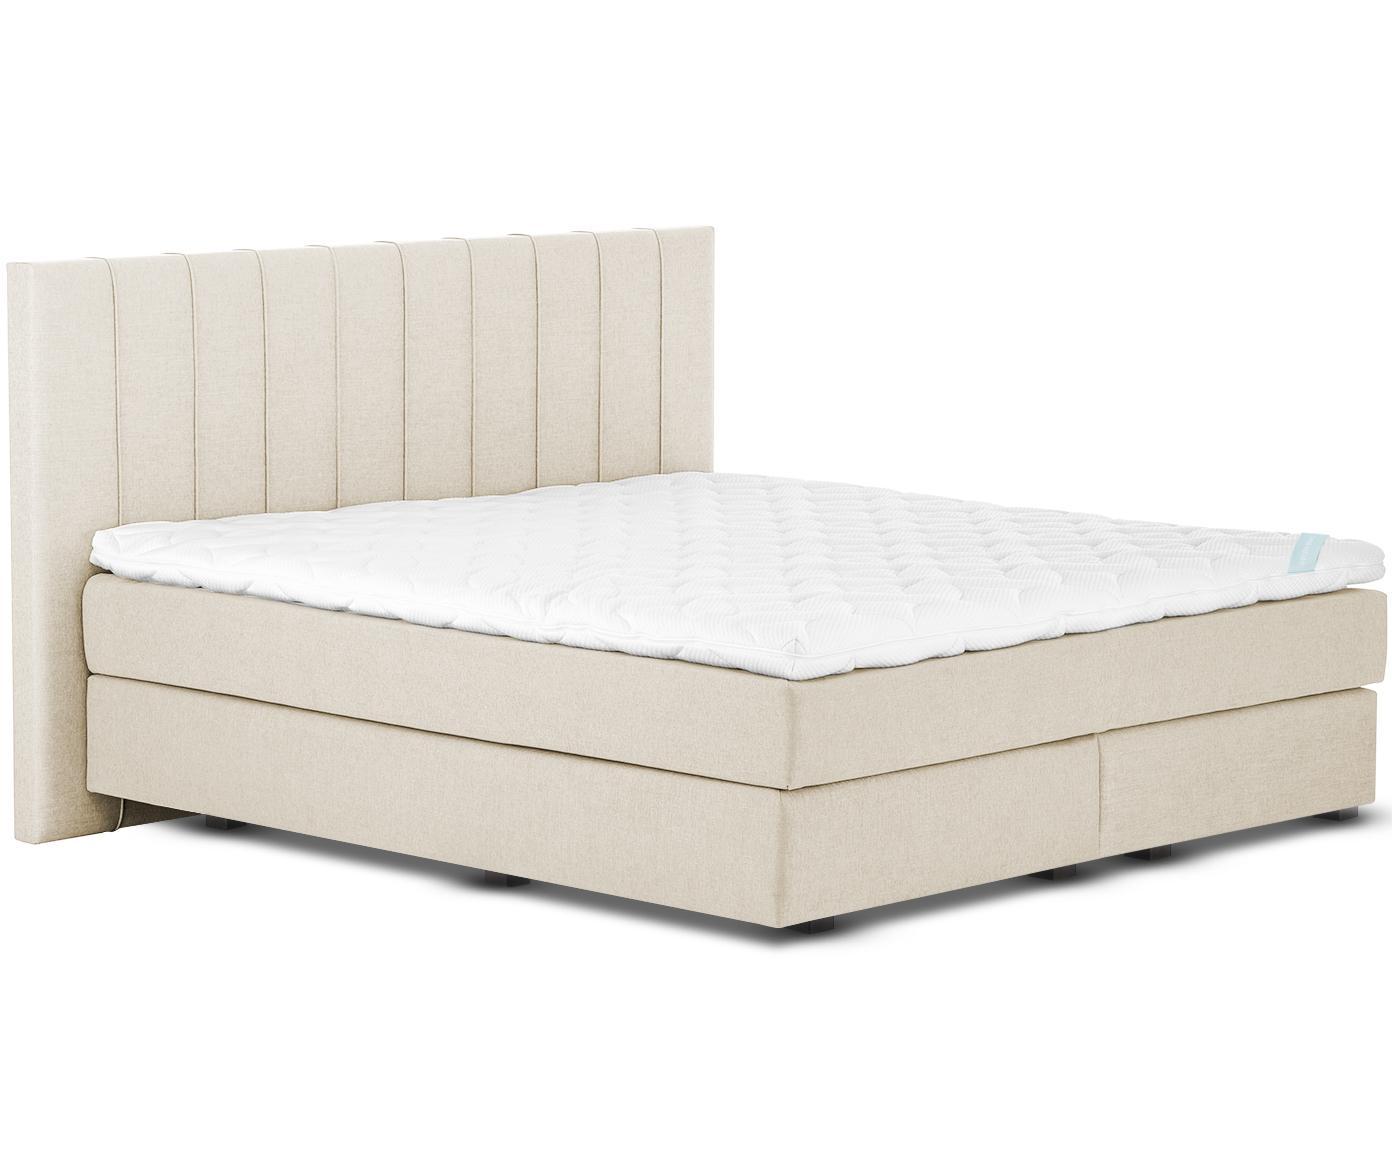 Premium boxspring bed Lacey, Matras: 7-zones-pocketveringkern , Poten: massief gelakt beukenhout, Beige, 160 x 200 cm